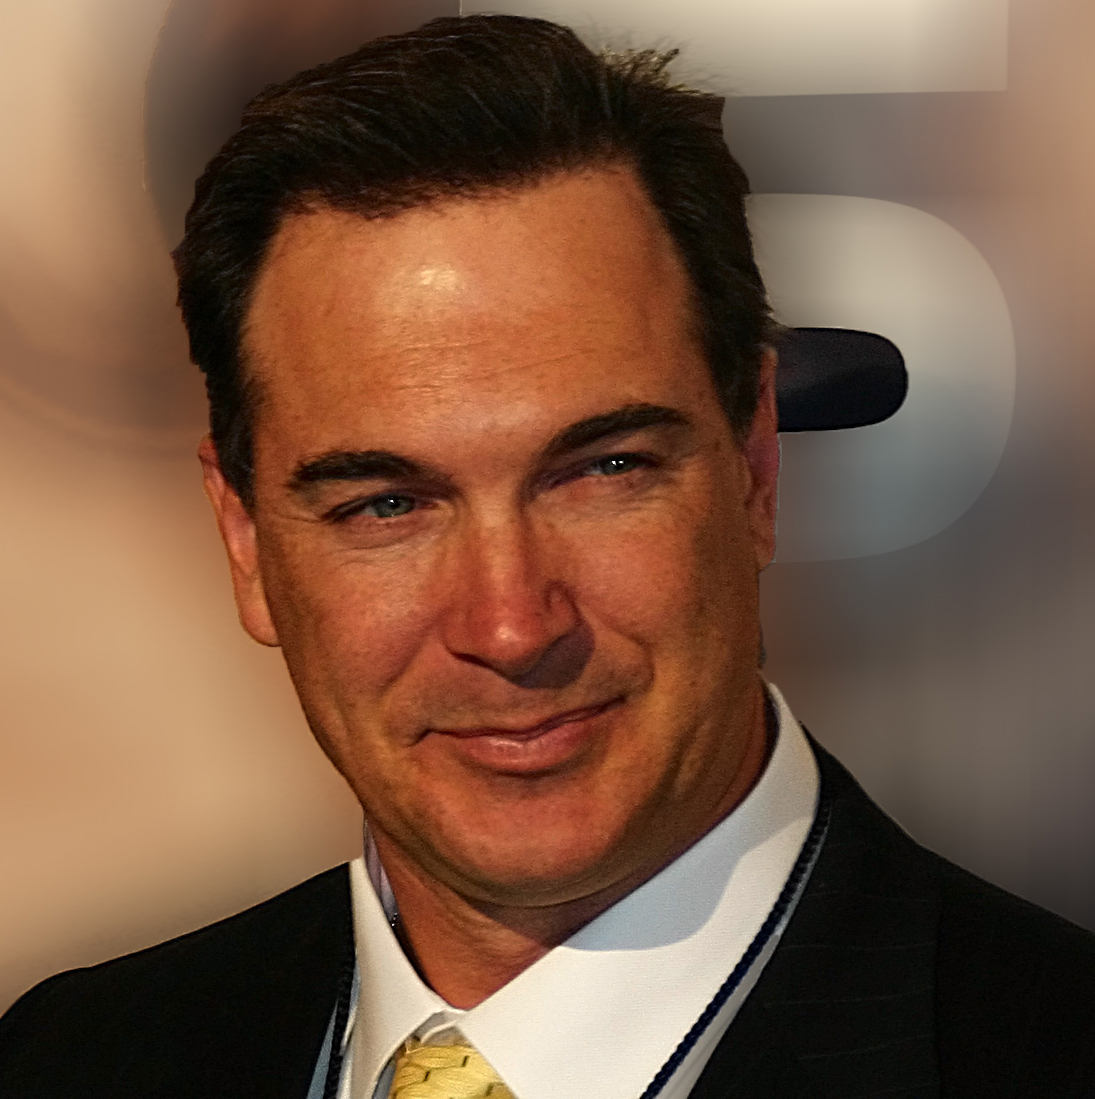 Patrick Warburton - Wikiquote